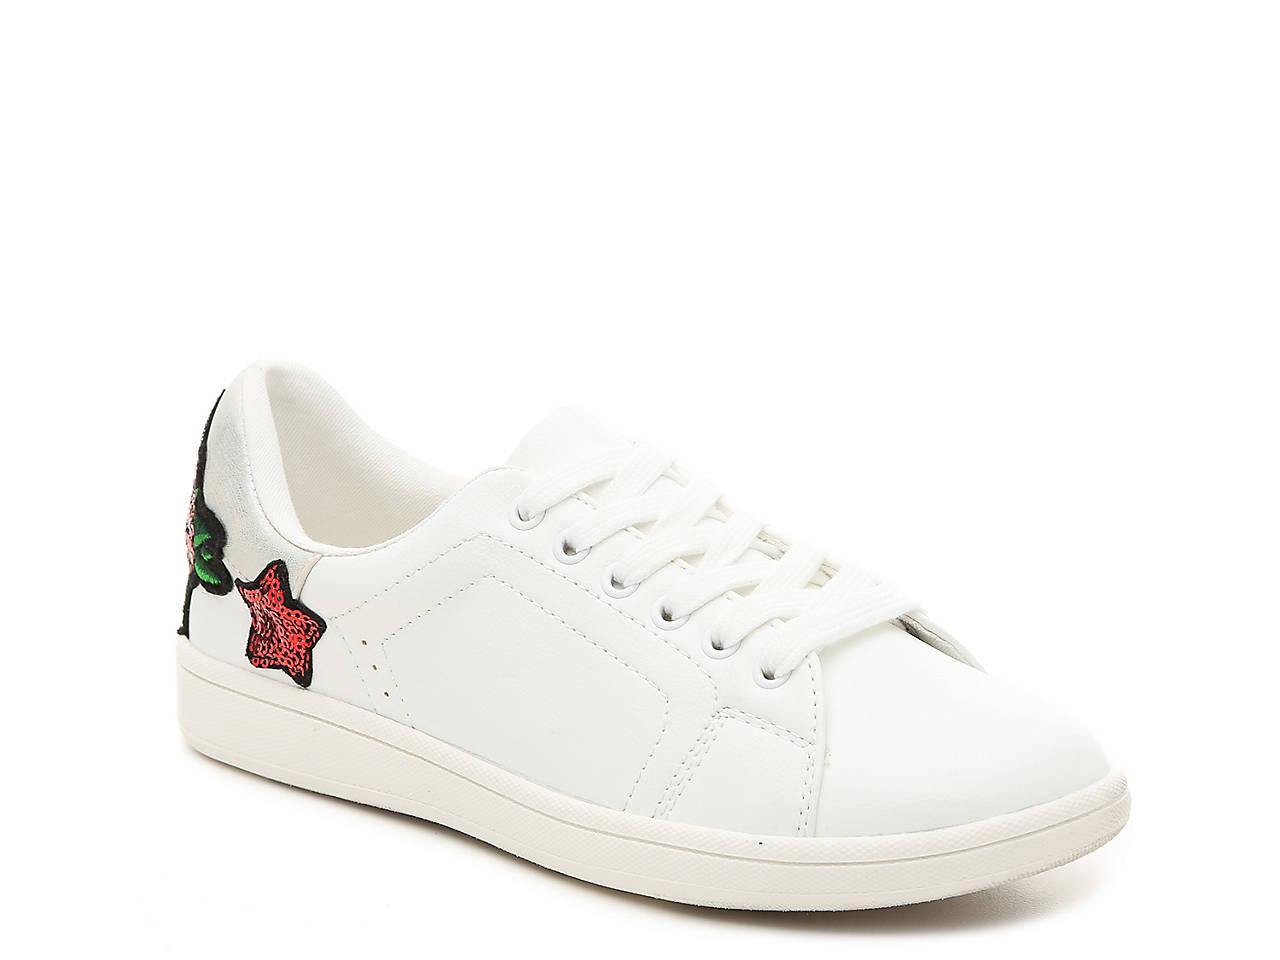 Sneaker high - white mix Große Auswahl An Günstigen Online pHGiiuD